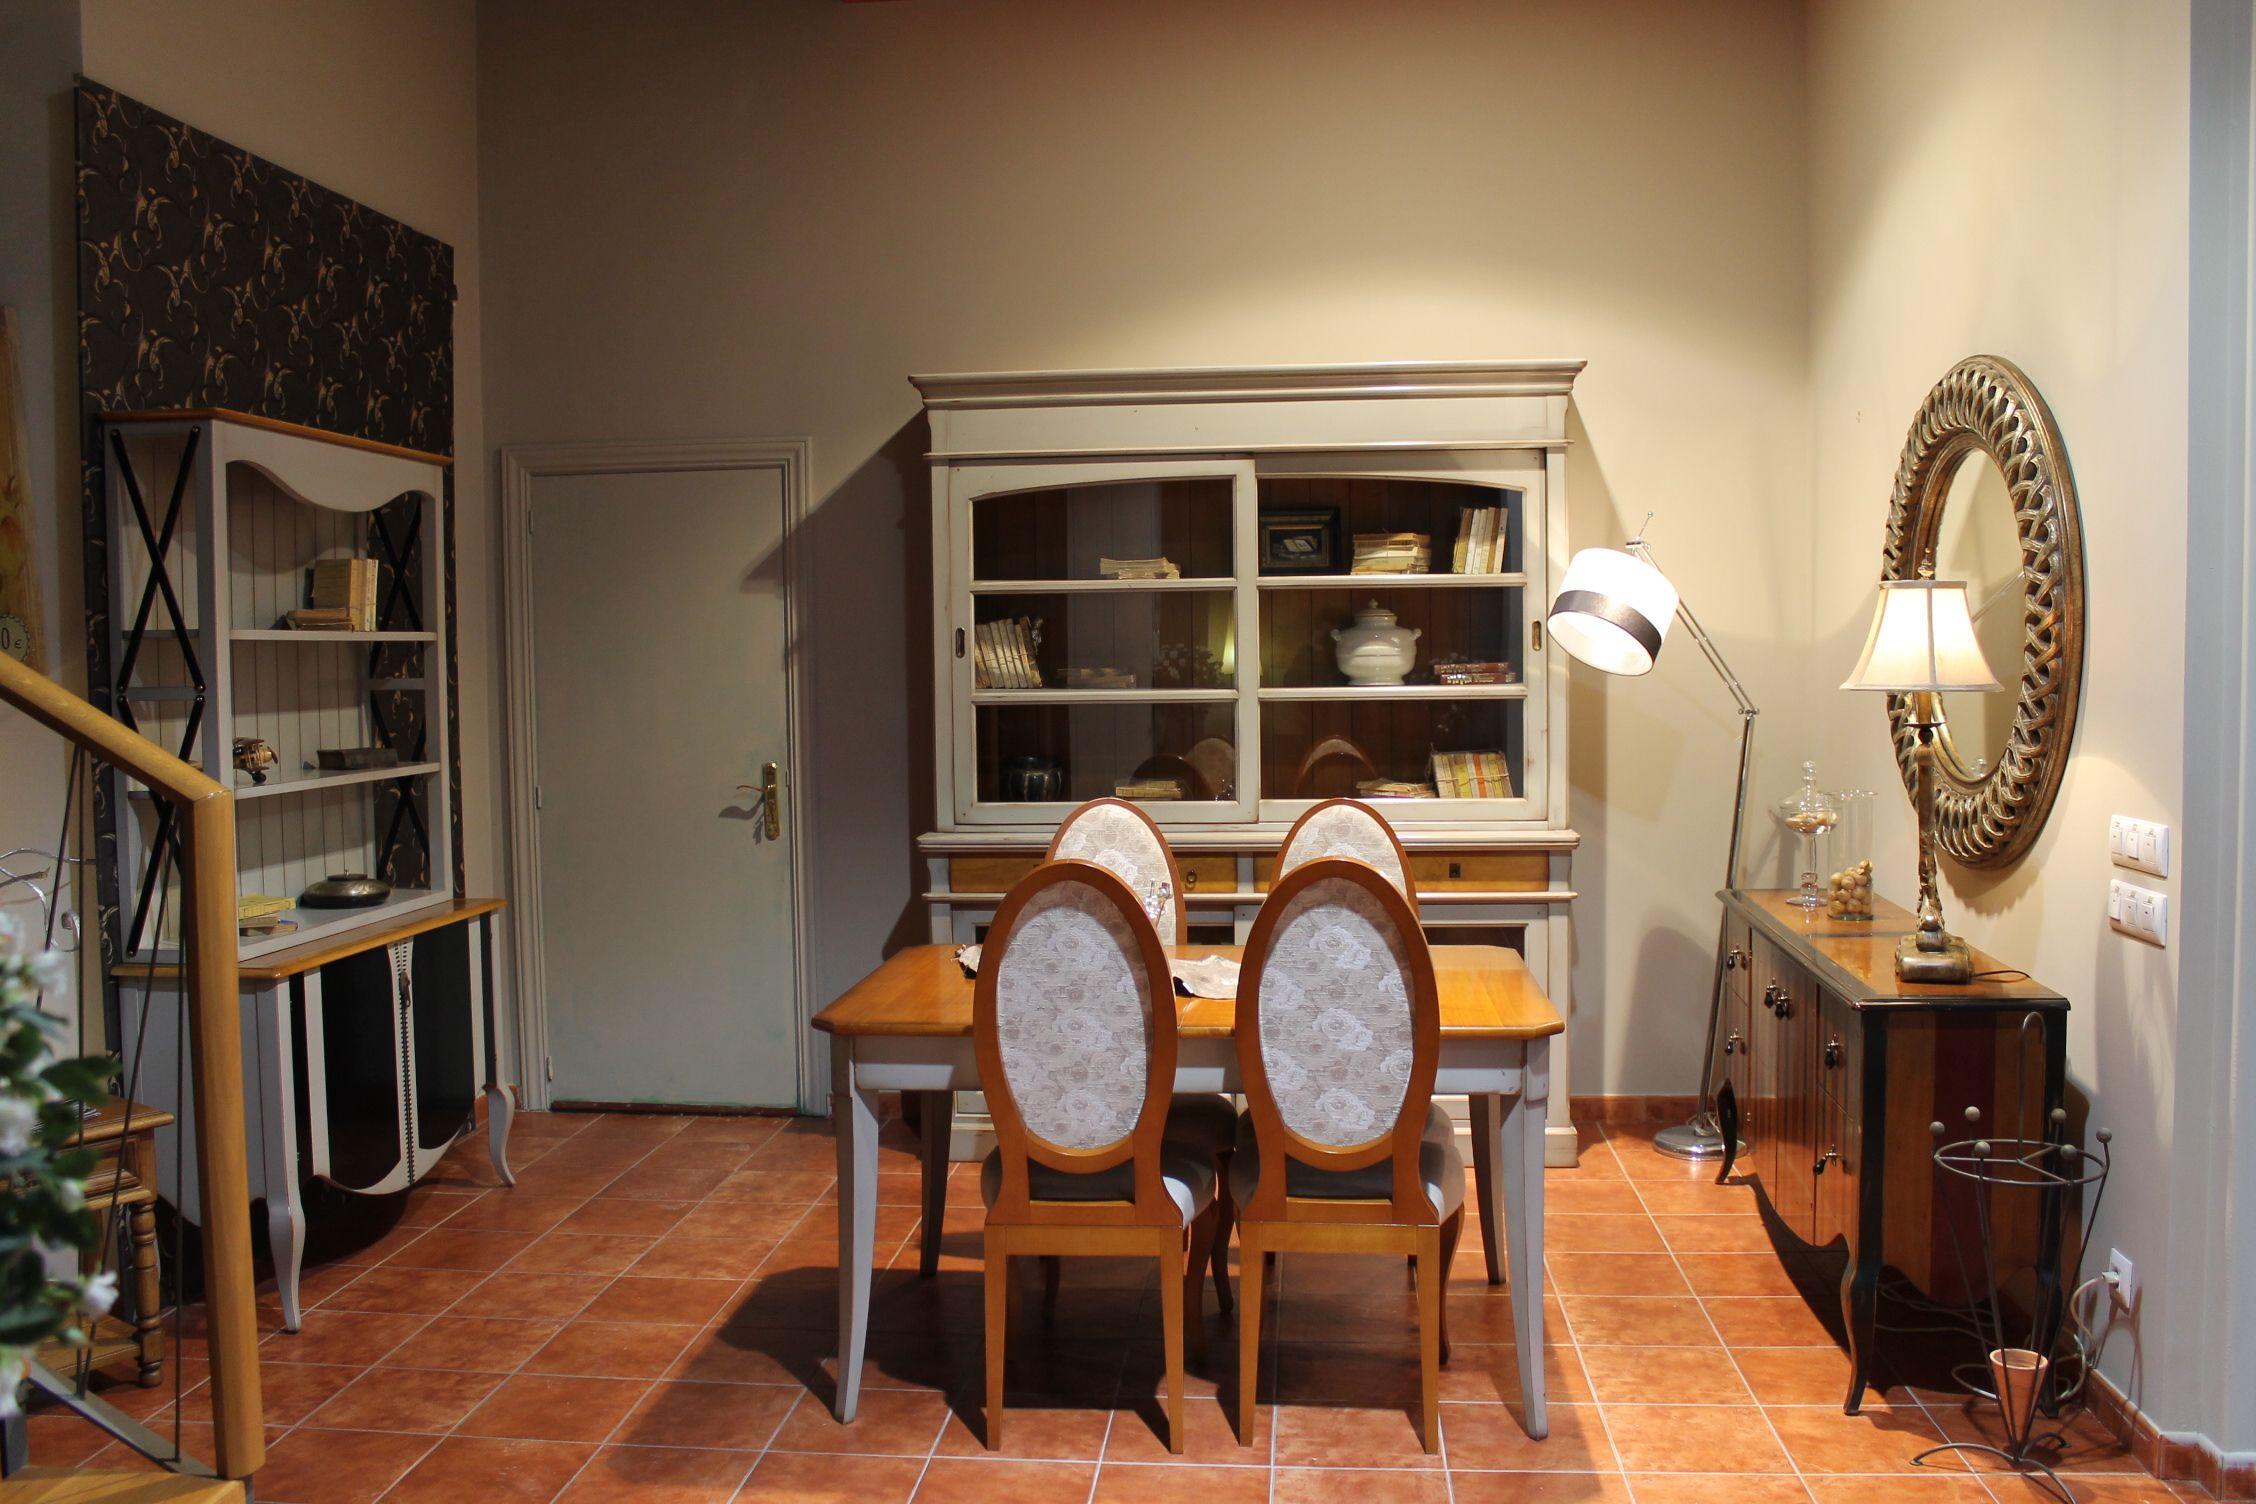 Ambiente de salon comedor clasico modelo opera www for Decoracion de salon comedor clasico